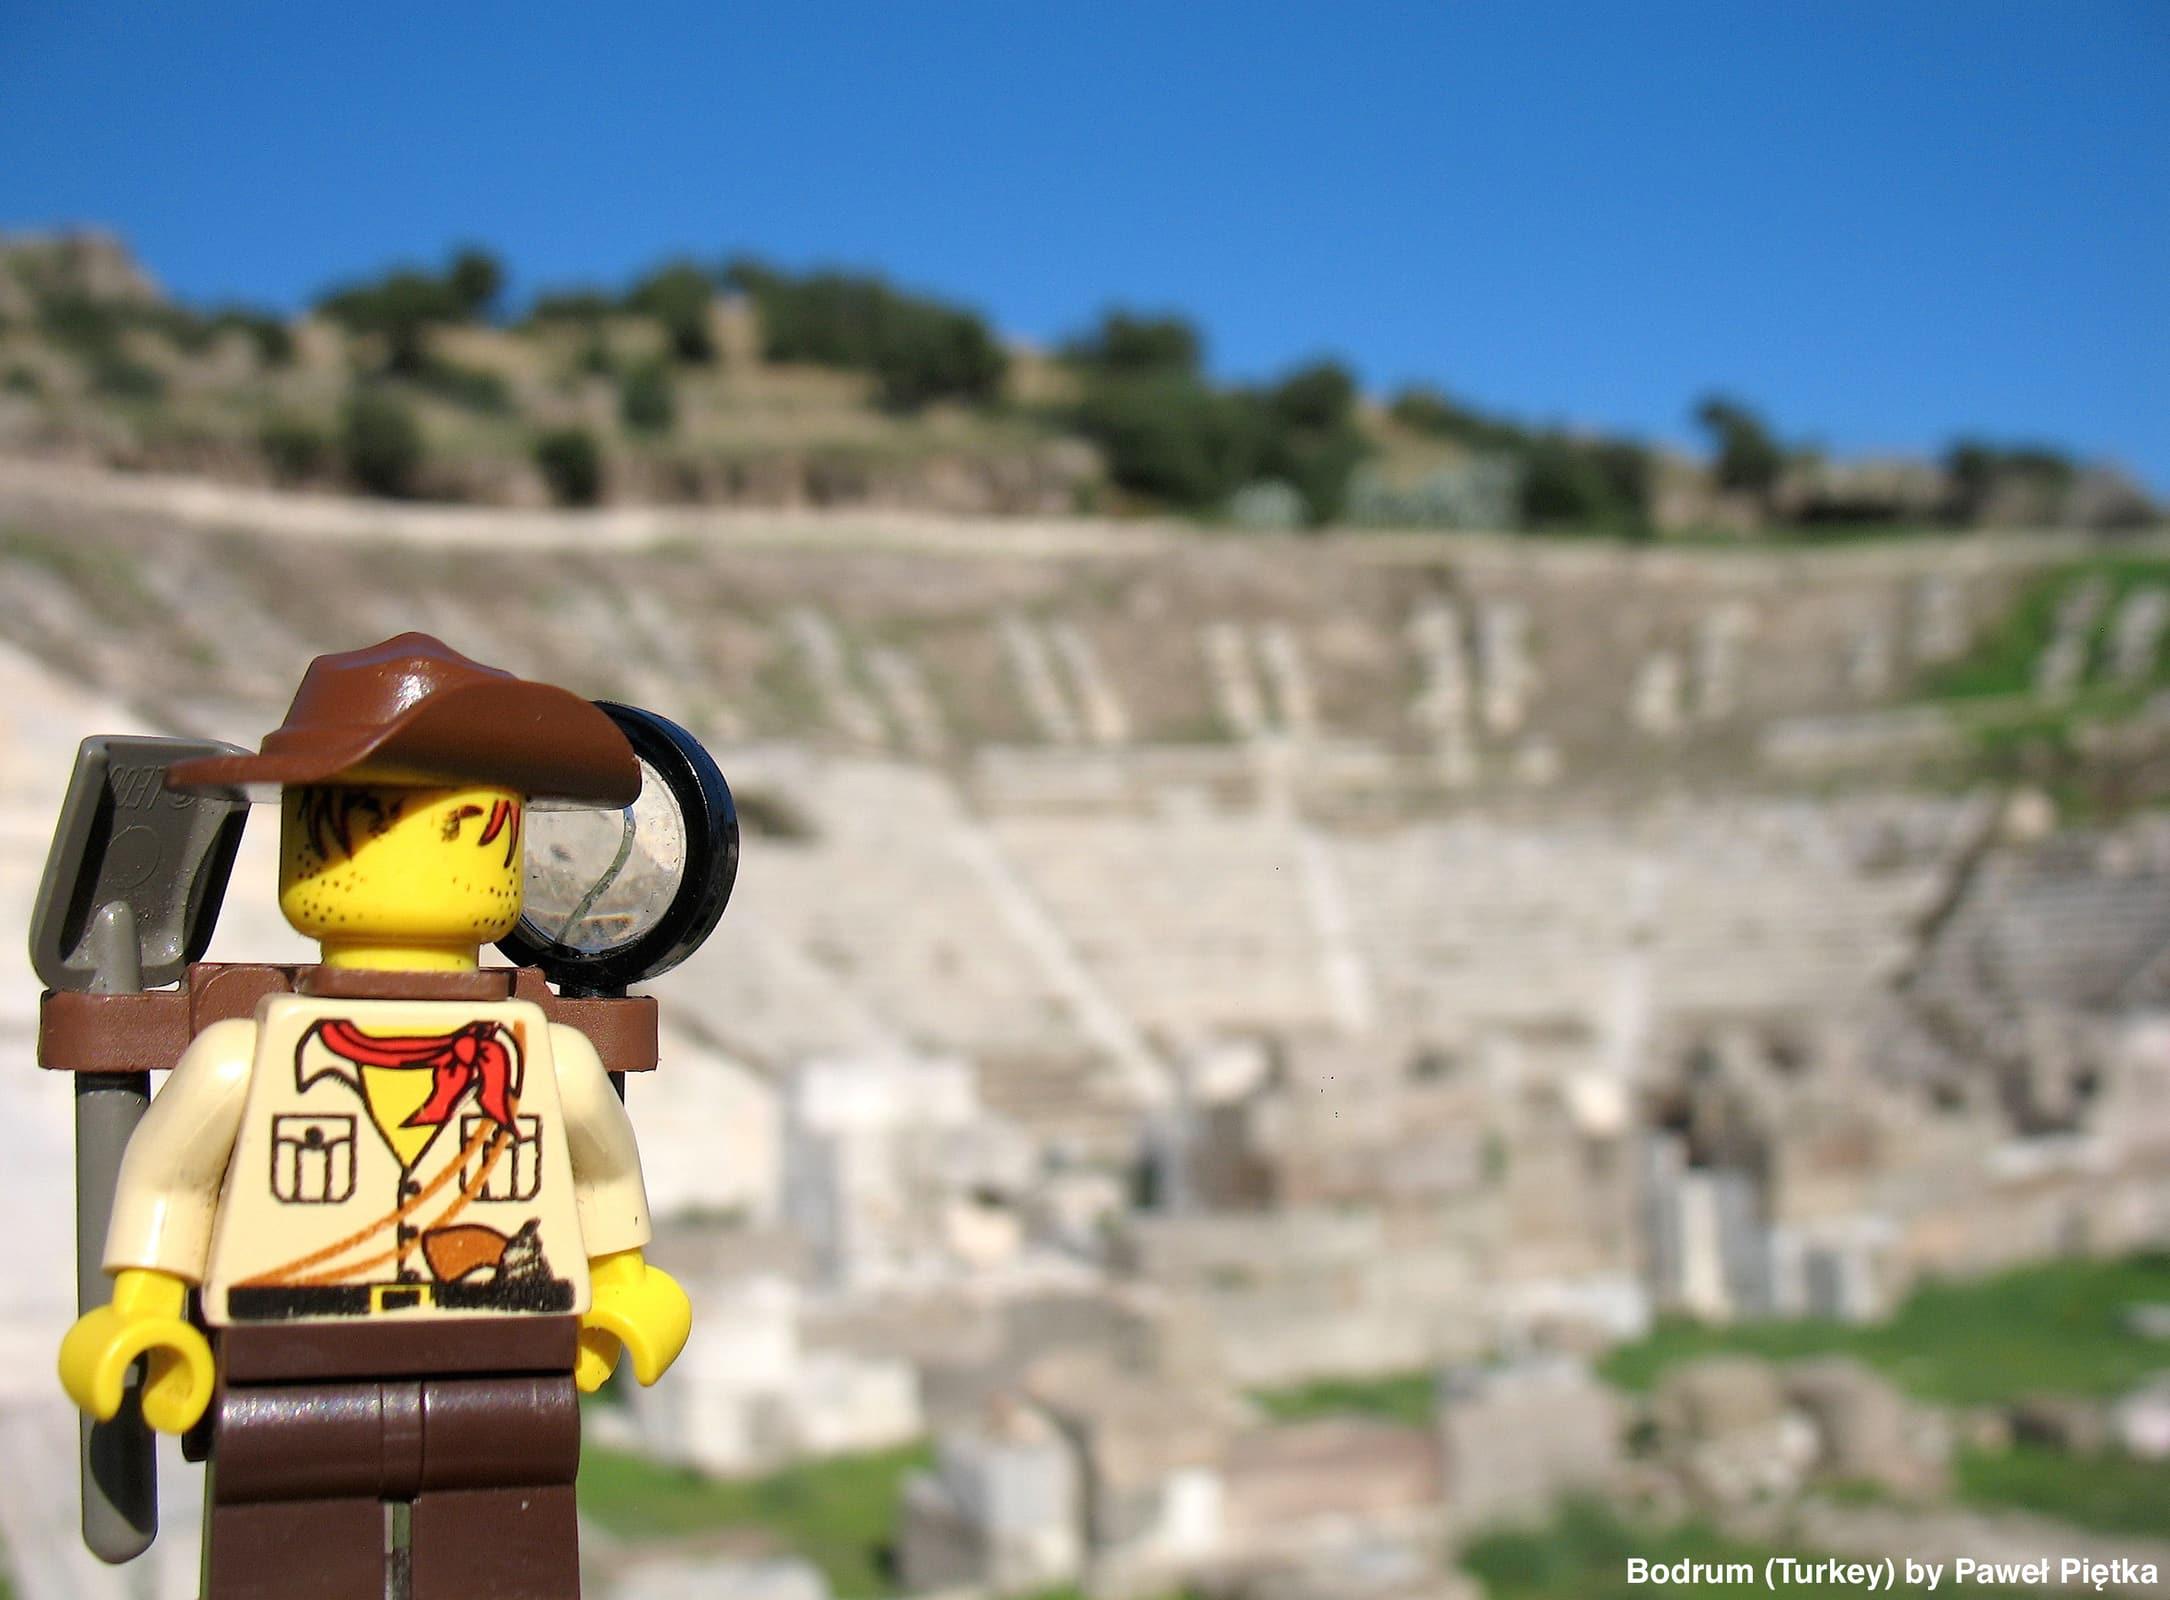 Bodrum (Turkey) - Theatre of Halicarnassus